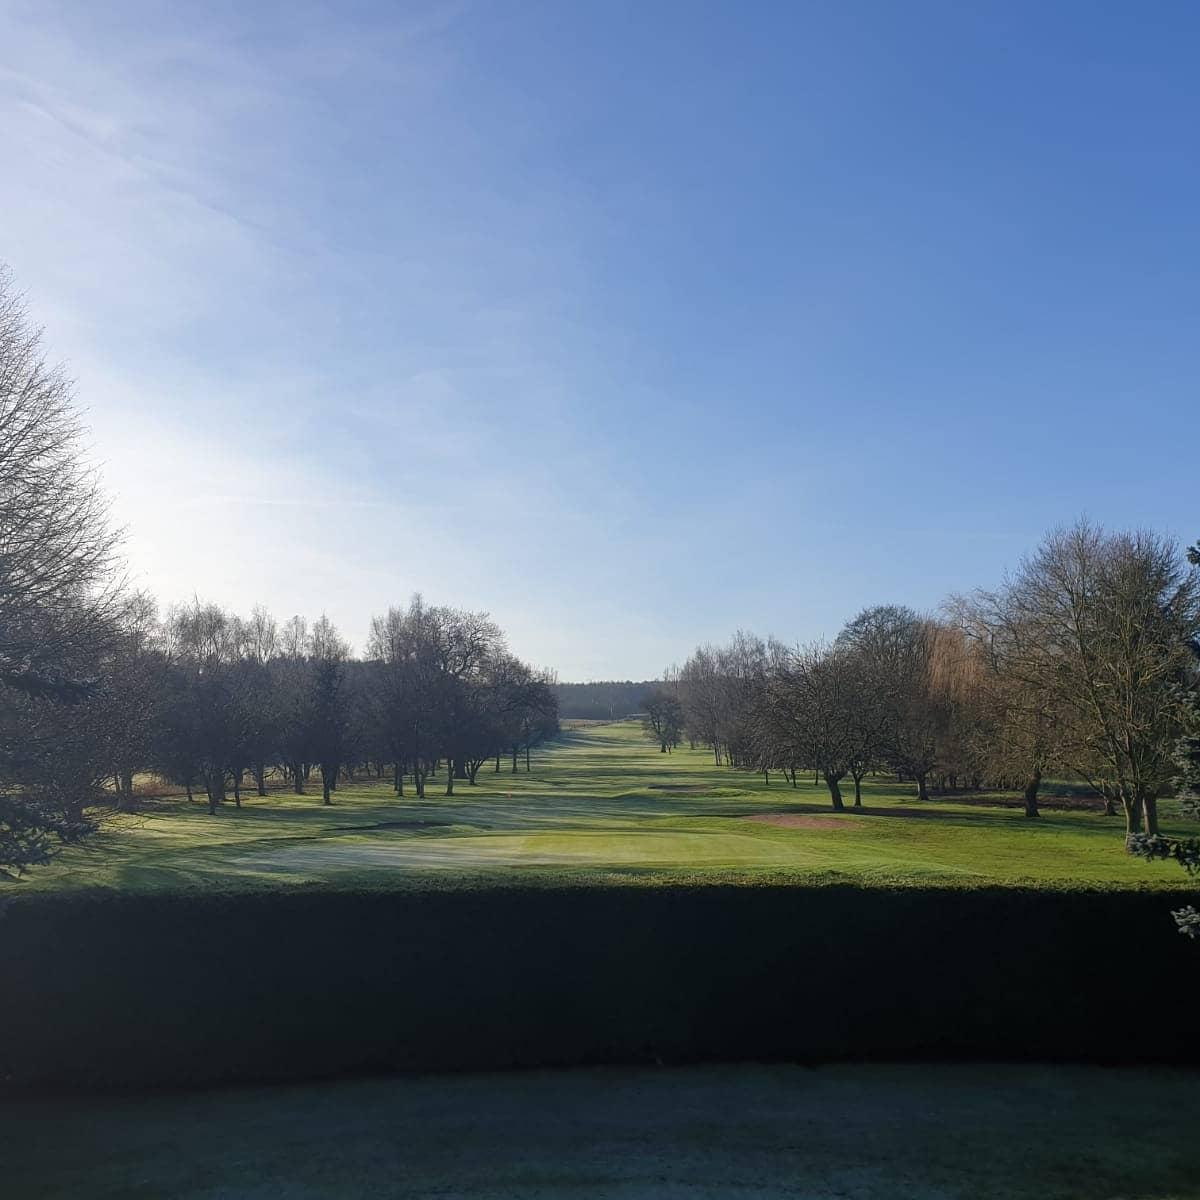 test Twitter Media - #BlueMonday = Blue Skys 😍⛳❄️☀️  Stunning winter morning 🙌 #LetsPlayGolf #MondayBlues #MondayMotivation #MondayVibes #golflife @MidlandsGolfer @TheClub @theclubtalks @IPGCourseupdate @IanDaviesEEEgol https://t.co/R110e2bz7r